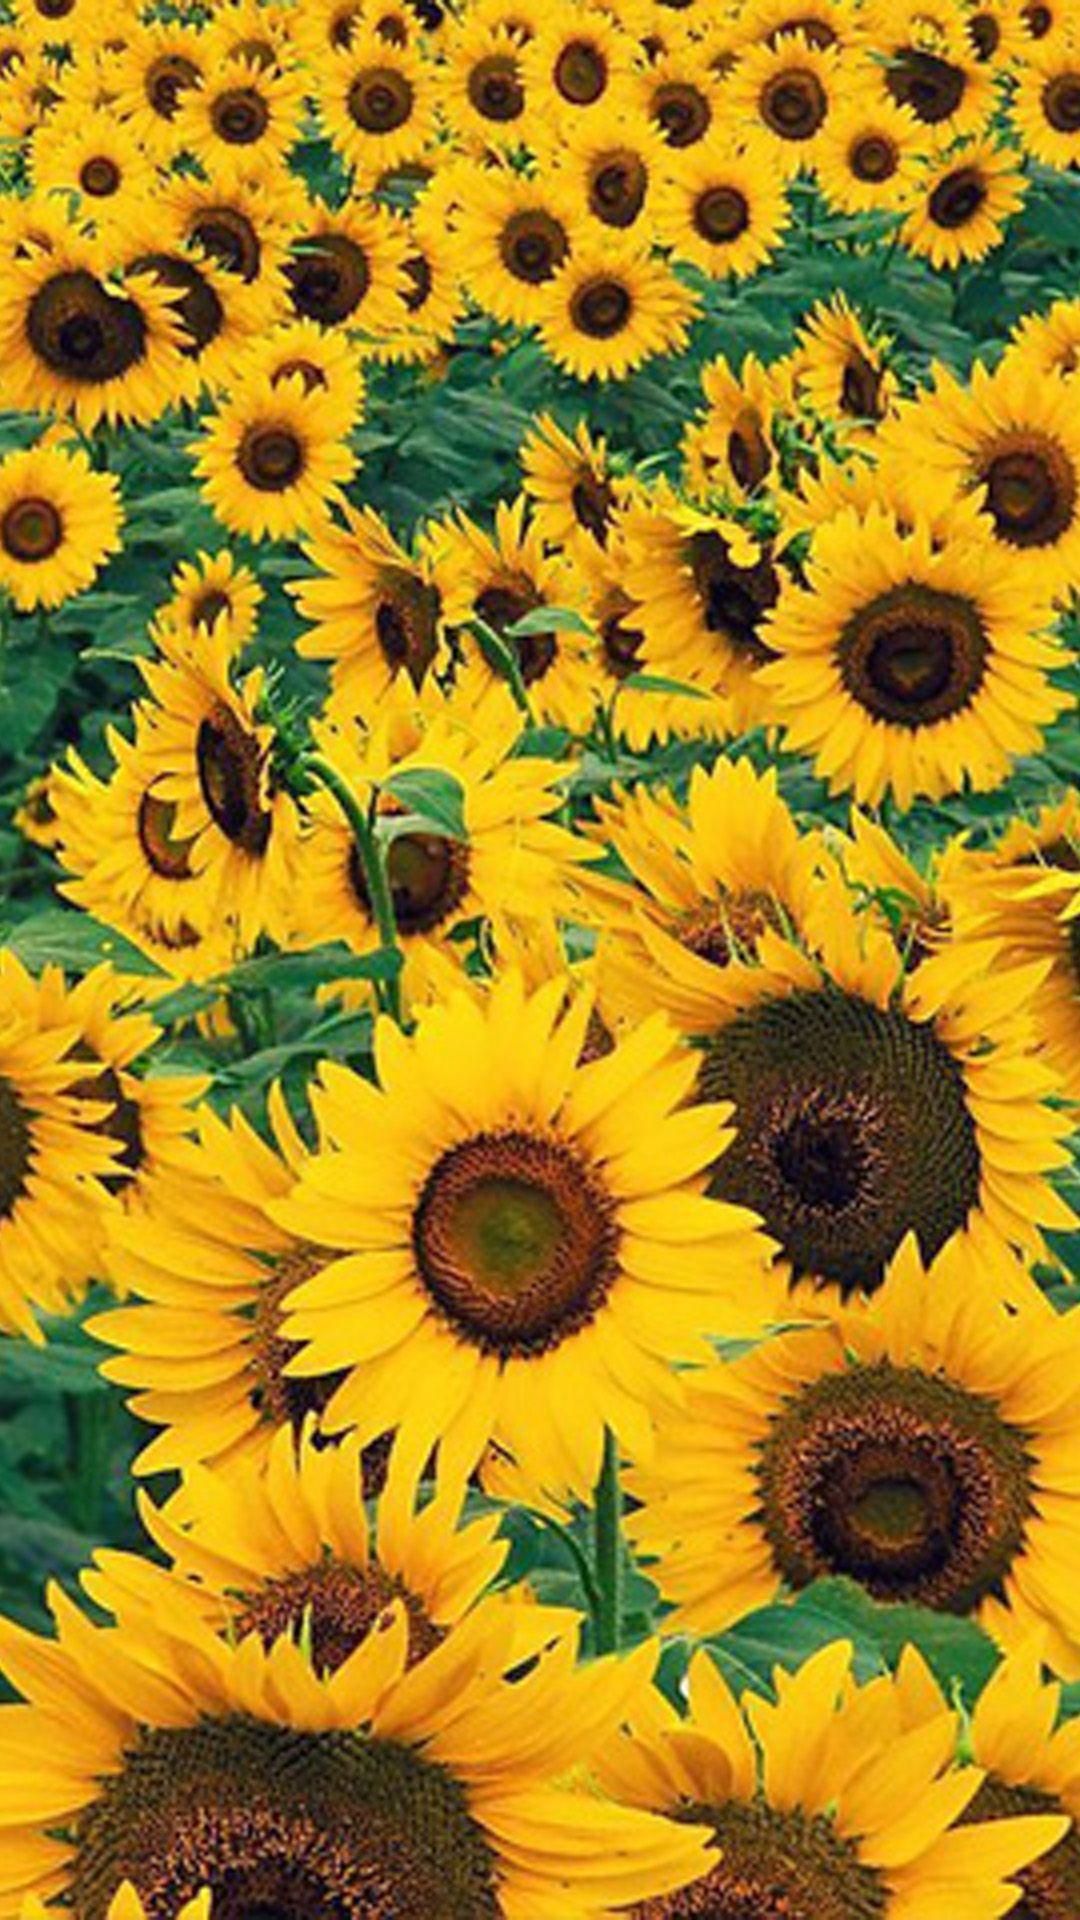 1080x1920 Sunflower Wallpapers Best Wallpapers Wallpapers Pinterest Sunflower Iphone Wallpaper Sunflower Wallpaper Wallpaper Iphone Christmas